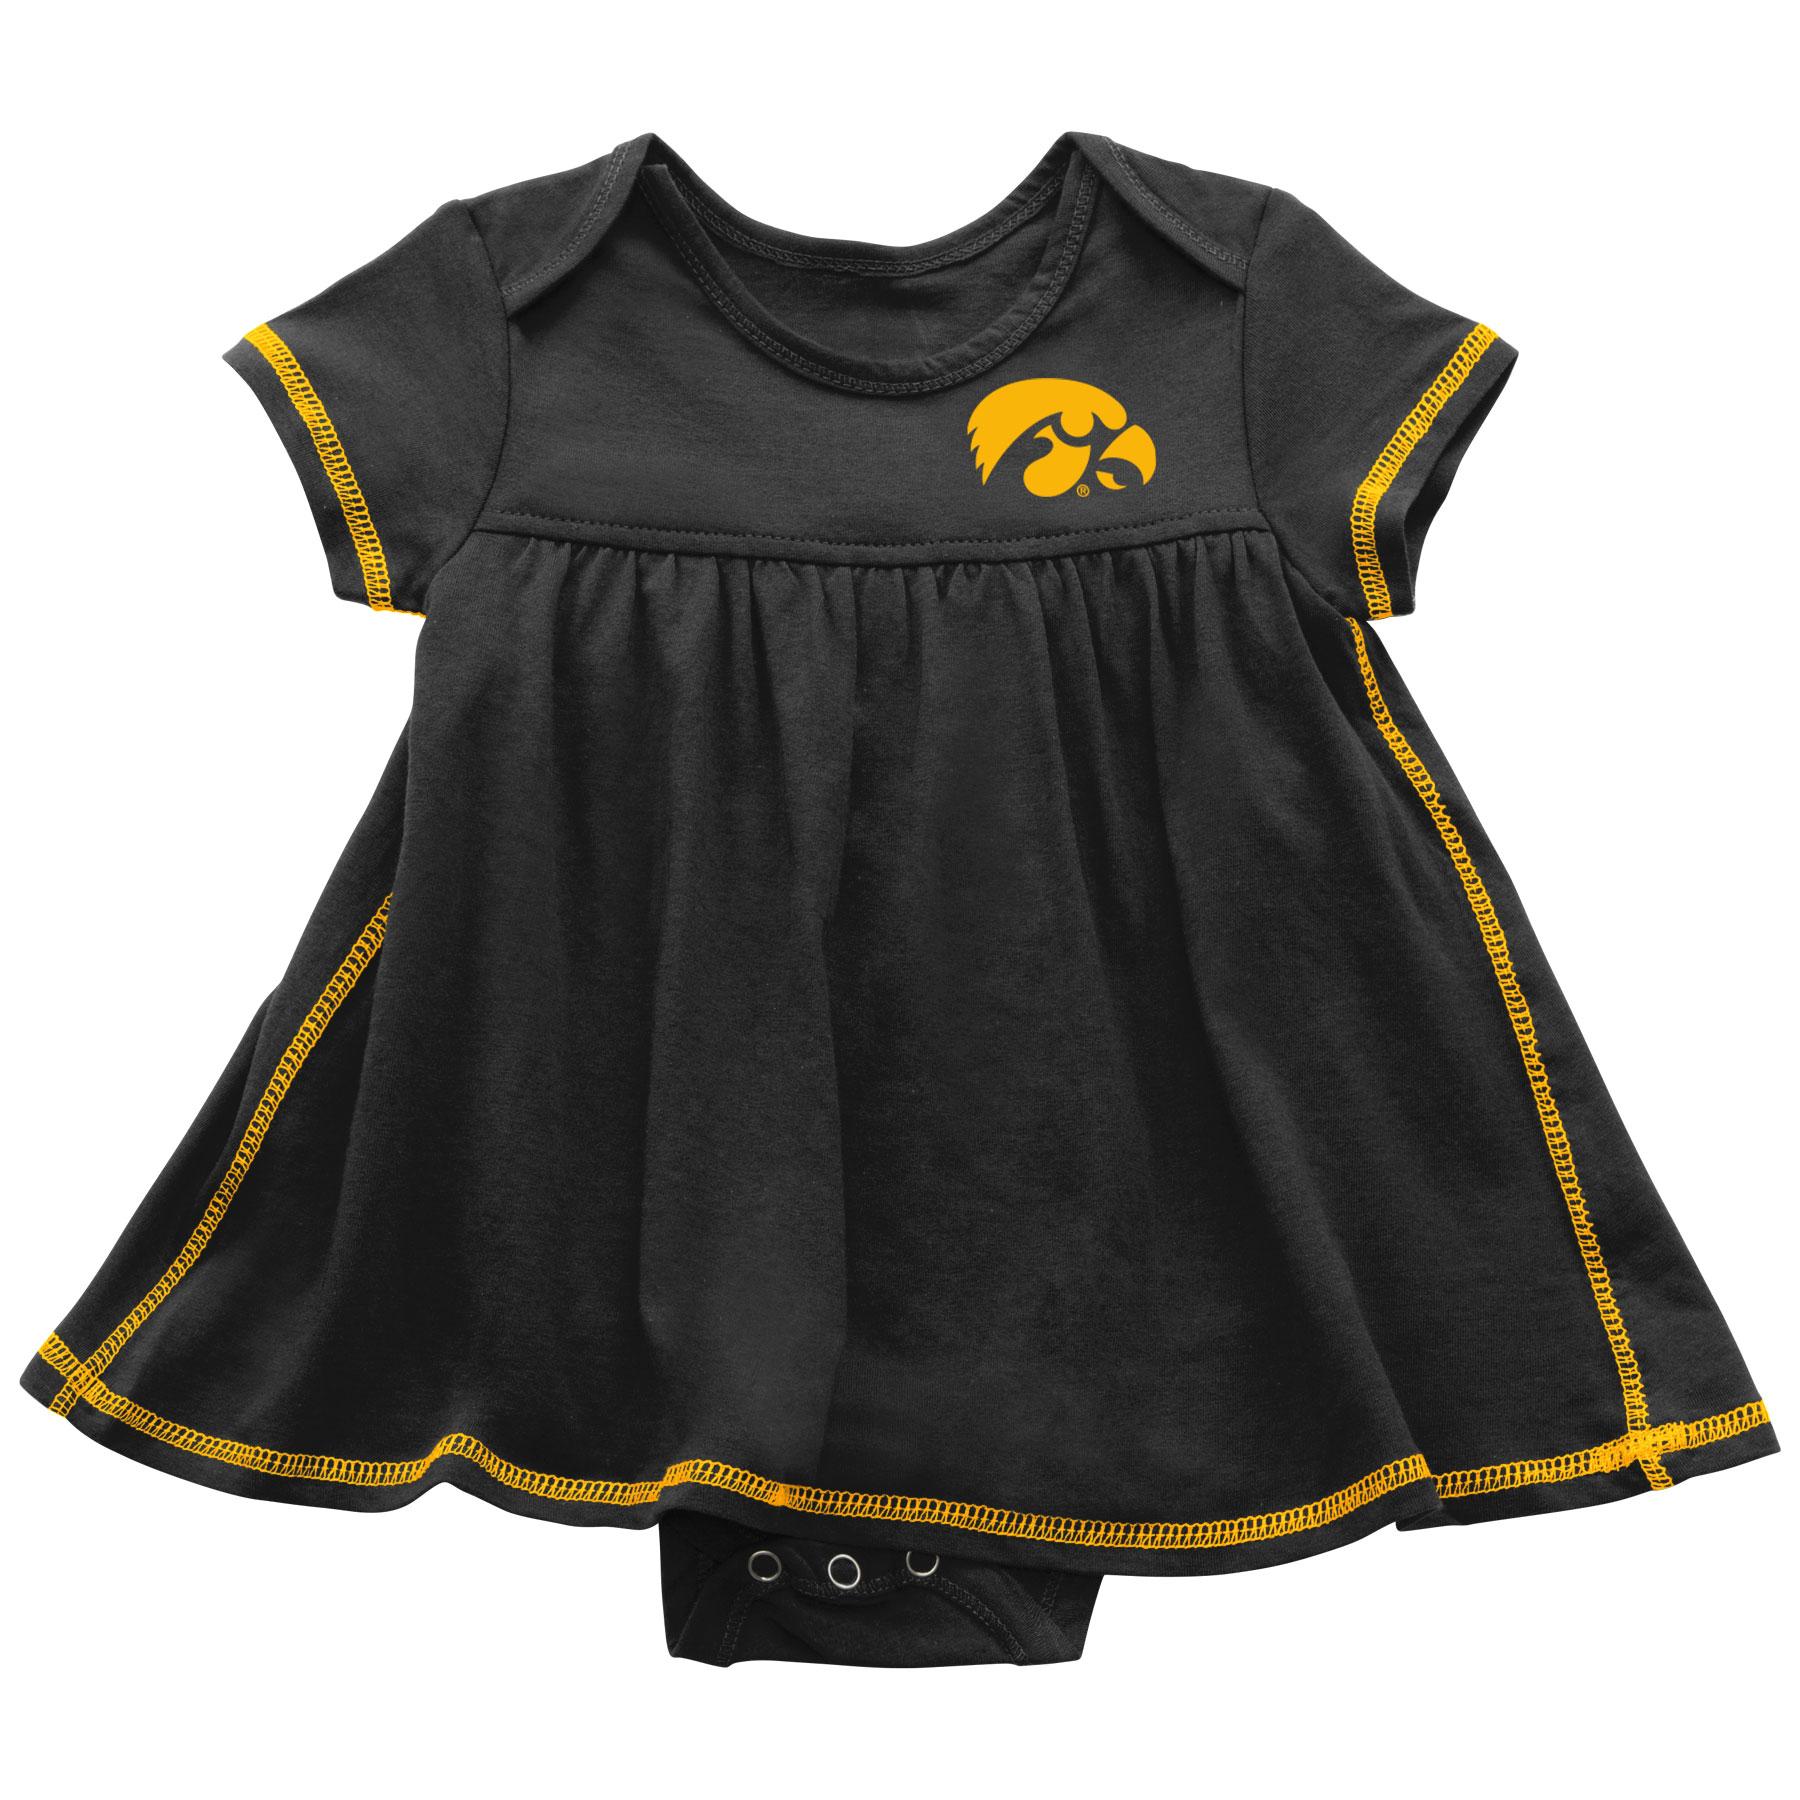 b7b009f67759 Infant   Toddler